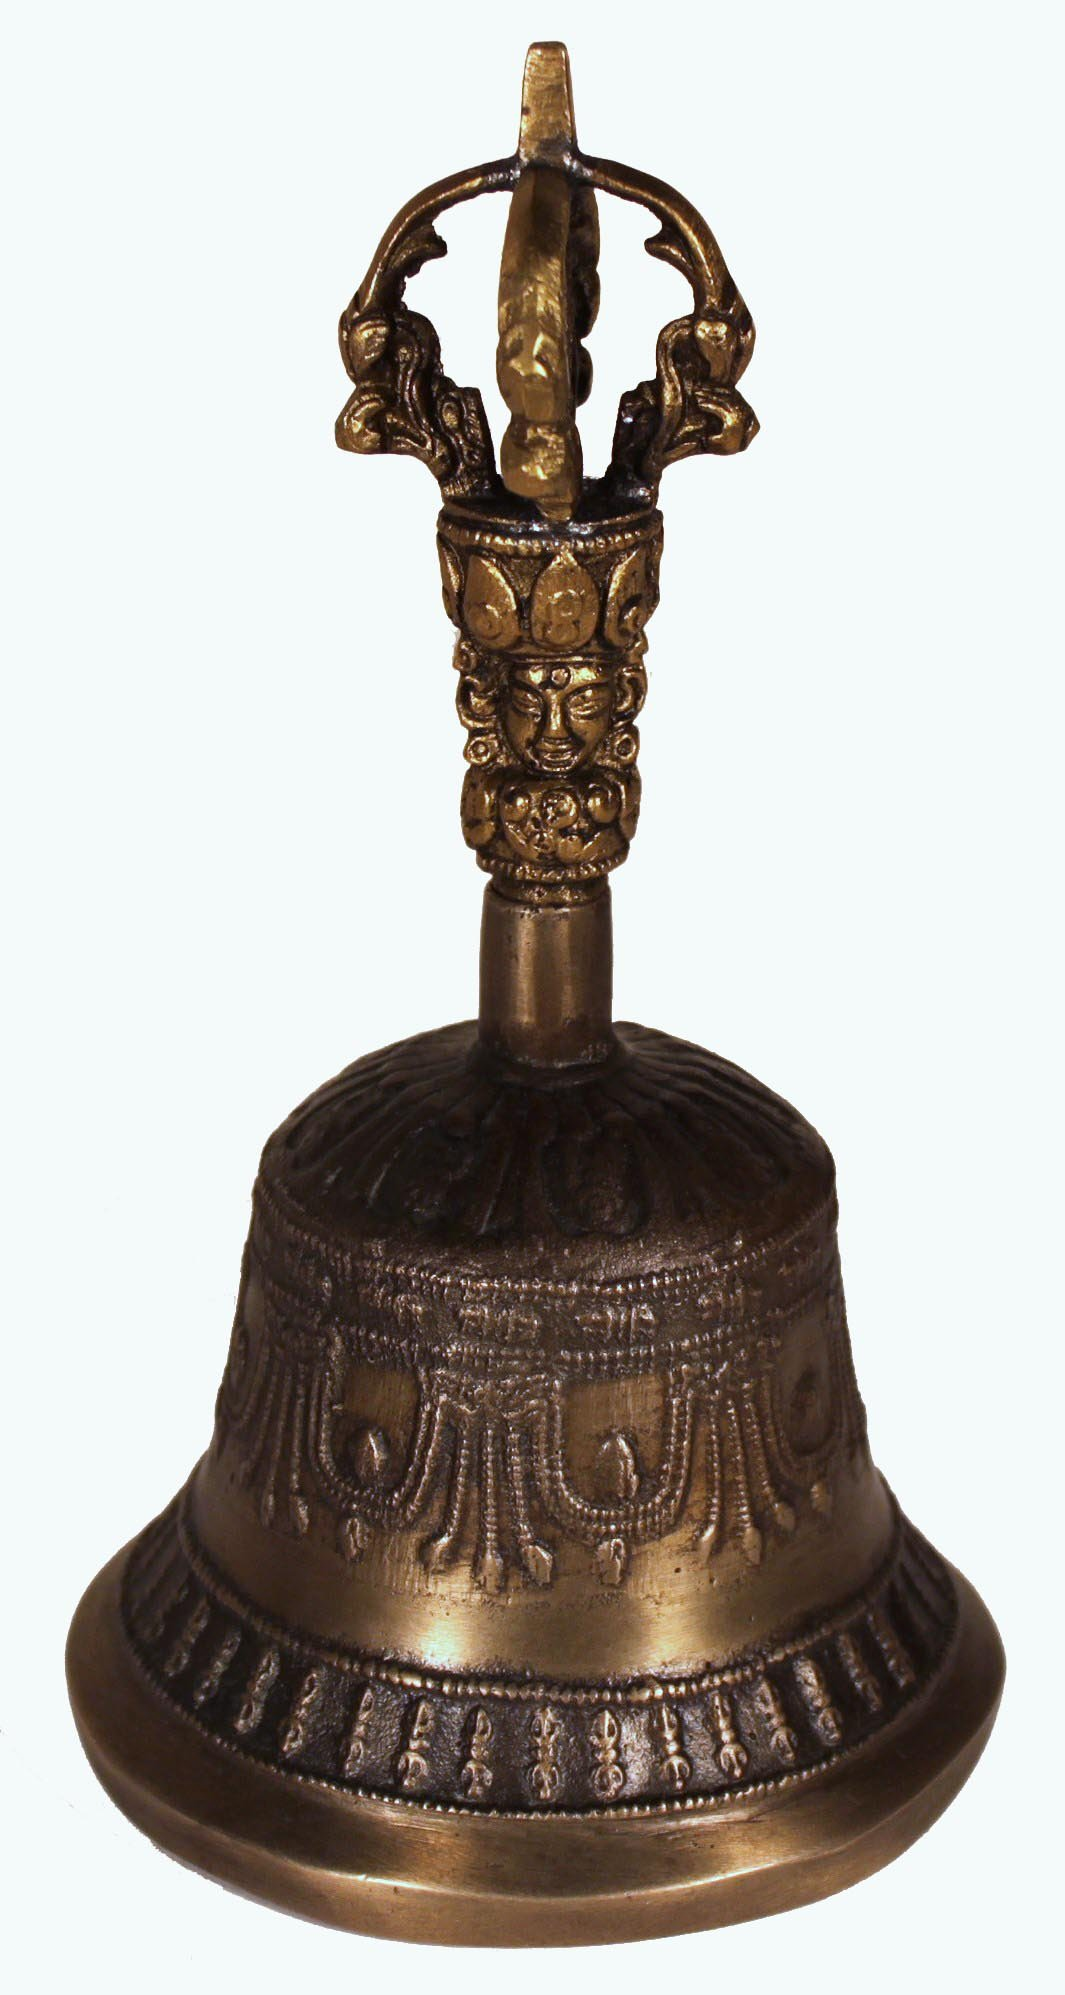 Antique Bell / Tibetan Meditation Bell / Tibetan / Multi-Layered Harmonics / Meditation Tool